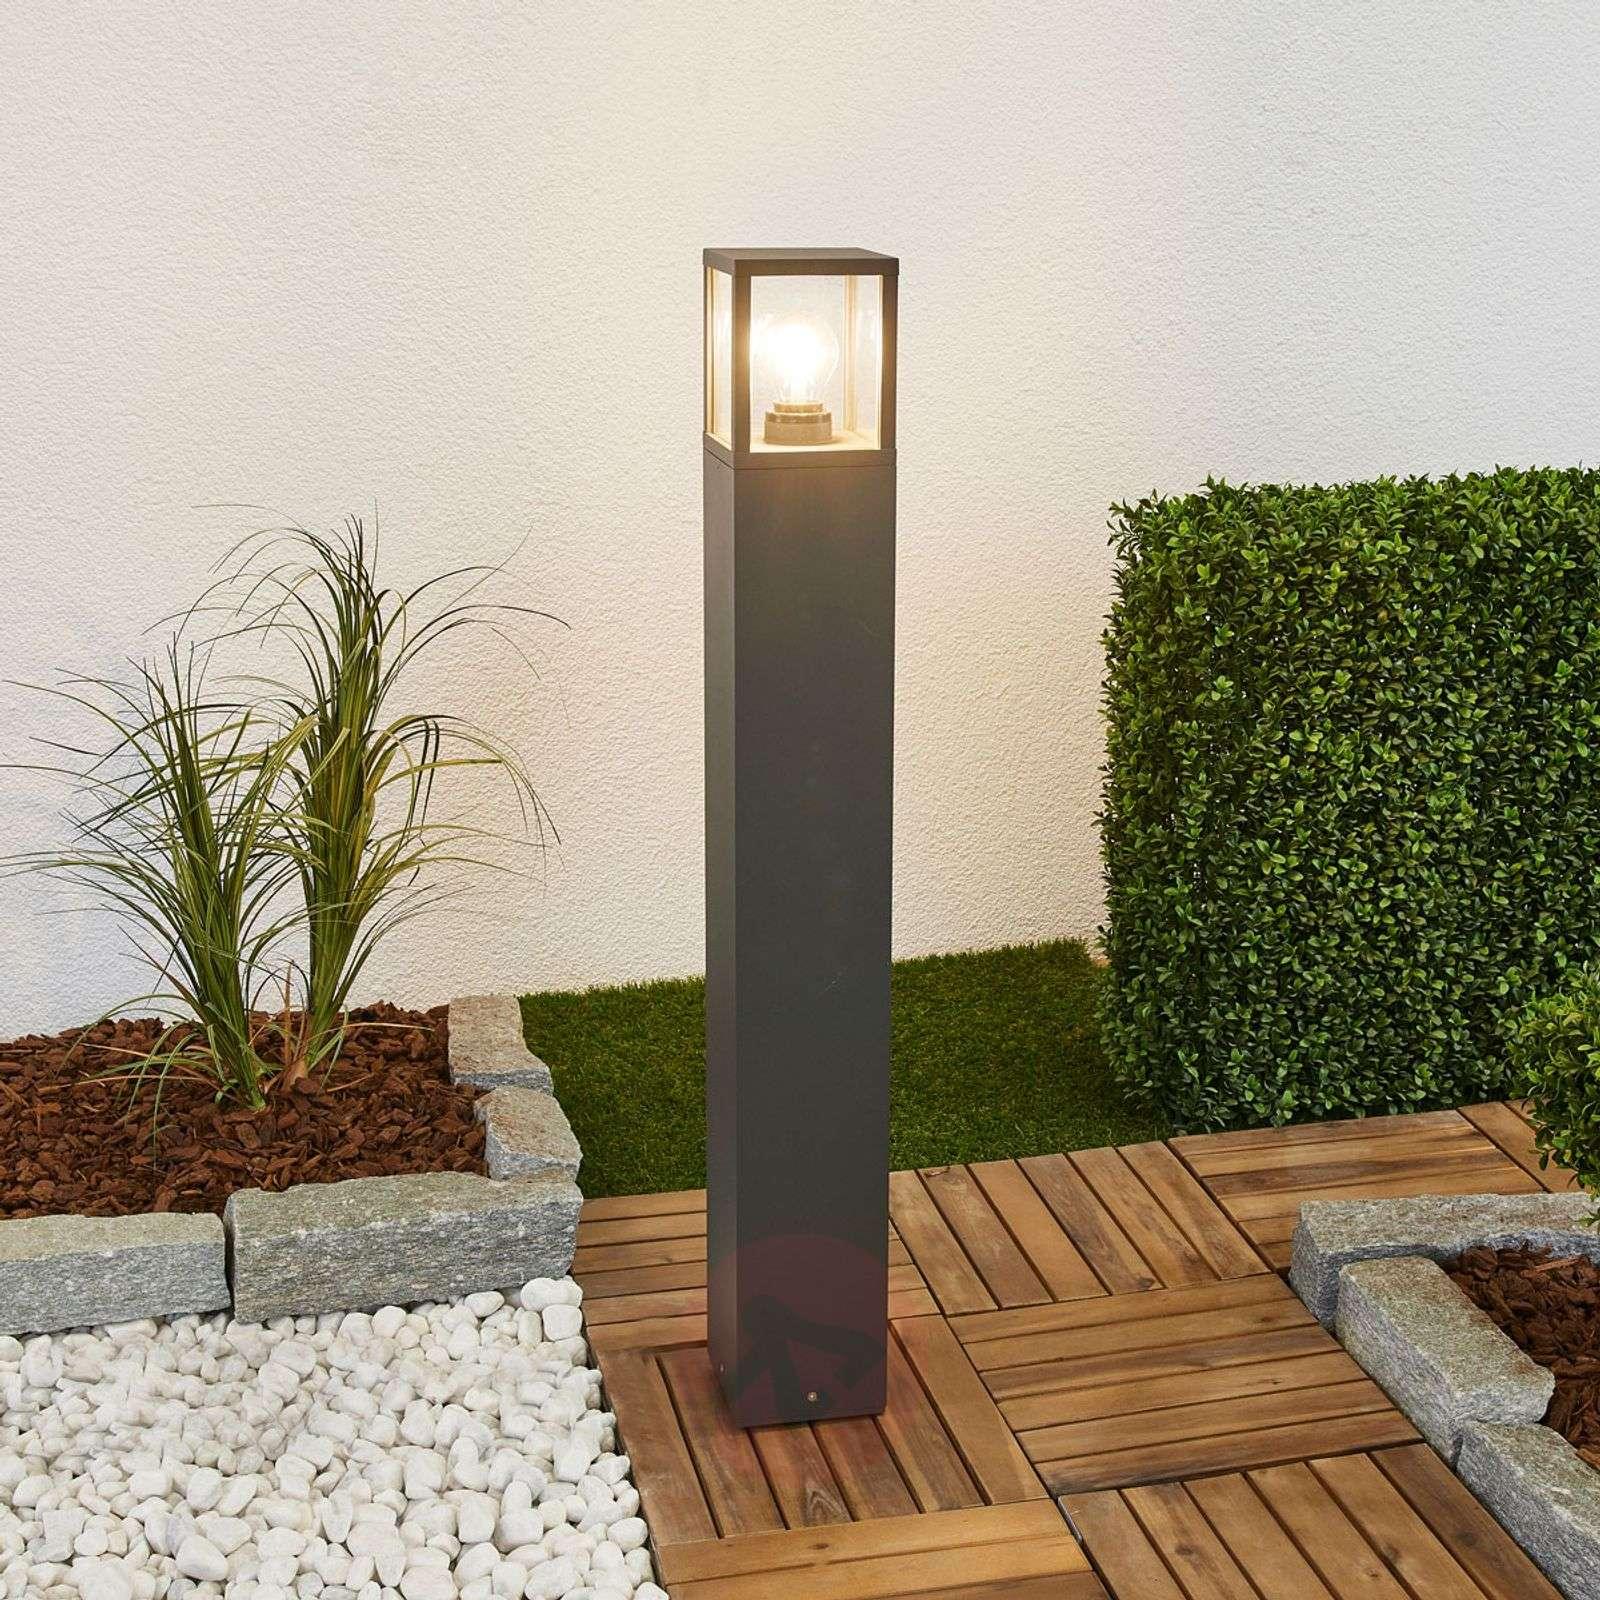 Klemens path light, graphite grey, 90cm high-9616127-01